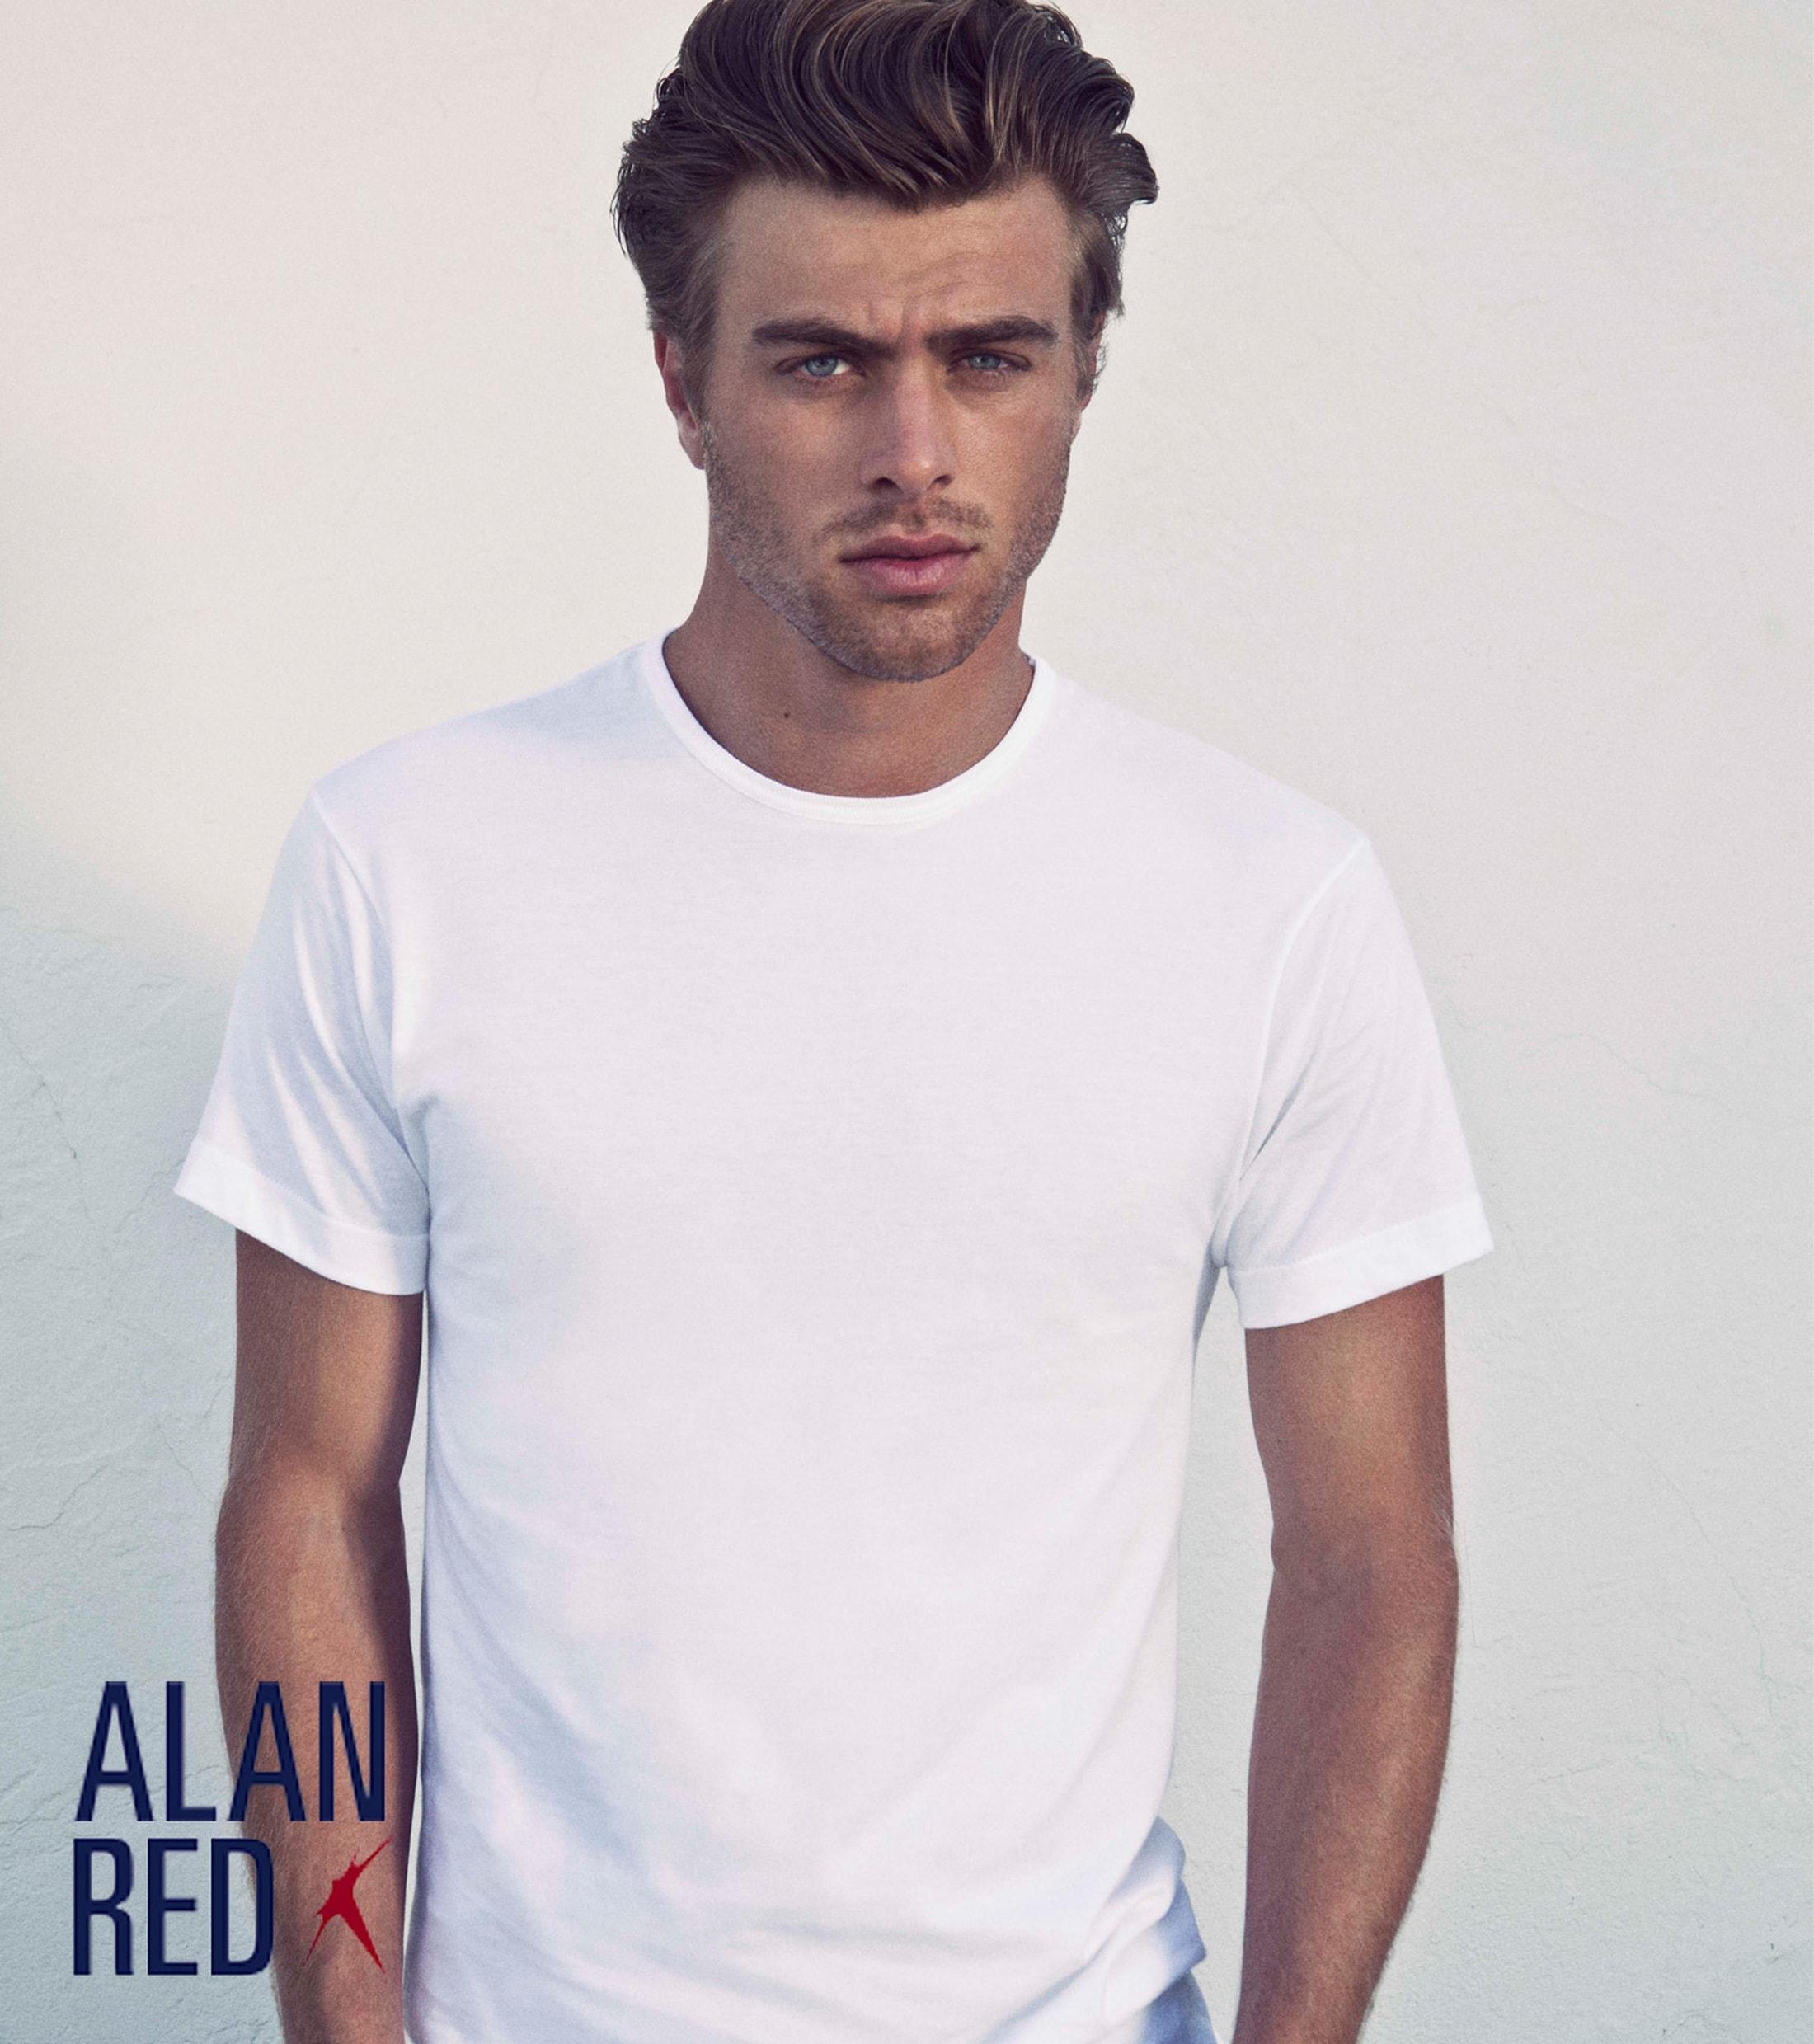 Alan Red Derby O-Neck T-shirt Ultramarine 1-Pack foto 3